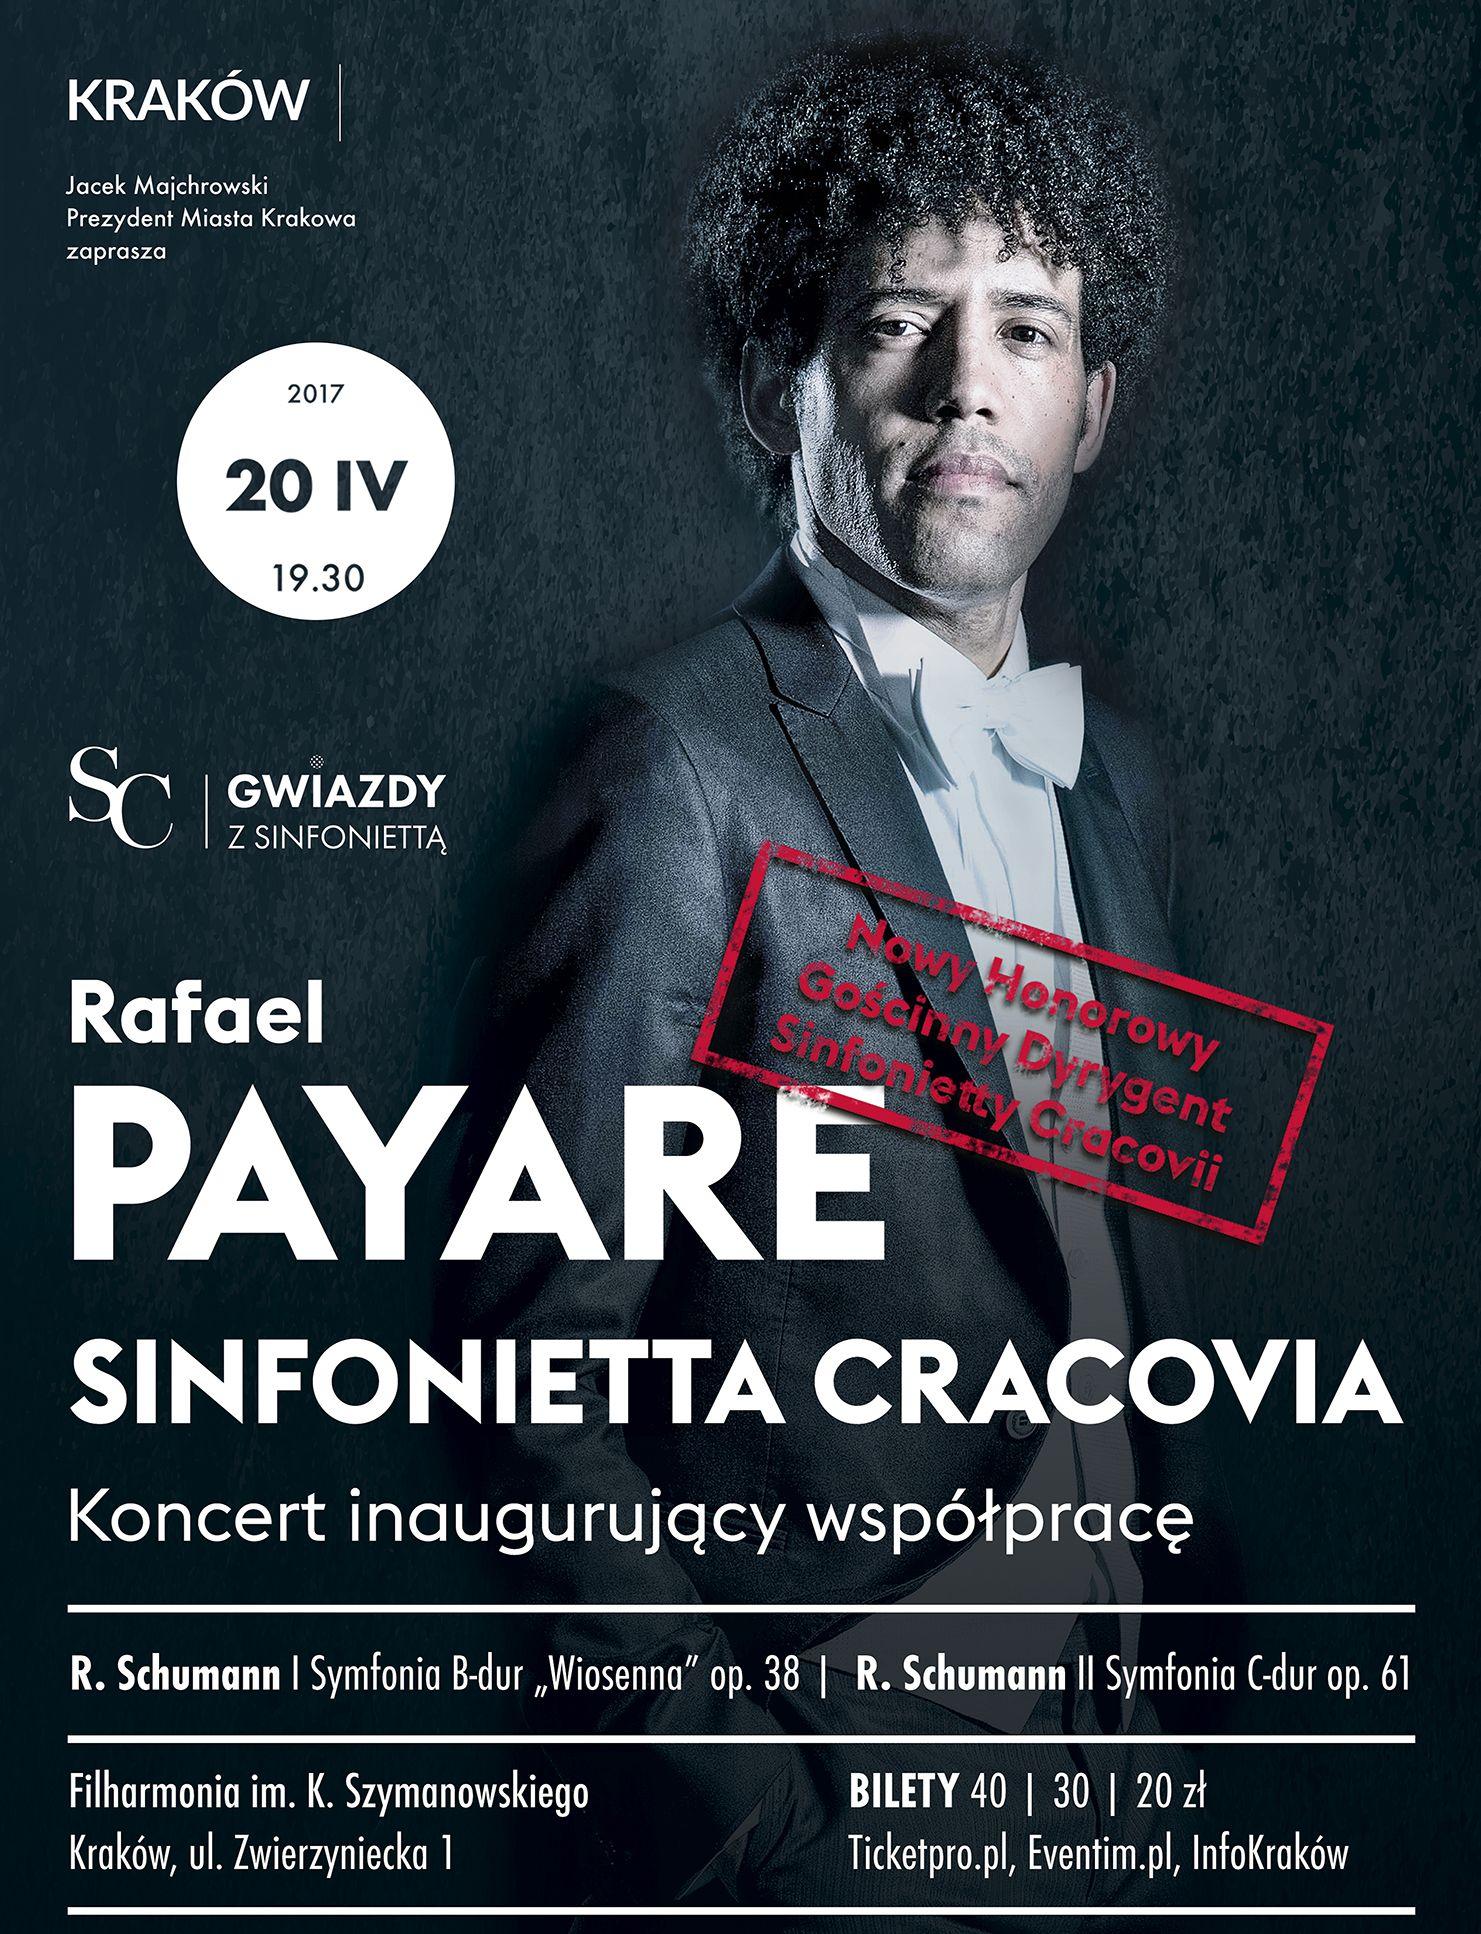 Rafael Payare, Sinfonietta Cracovia (źródło: materiały prasowe organizatora)